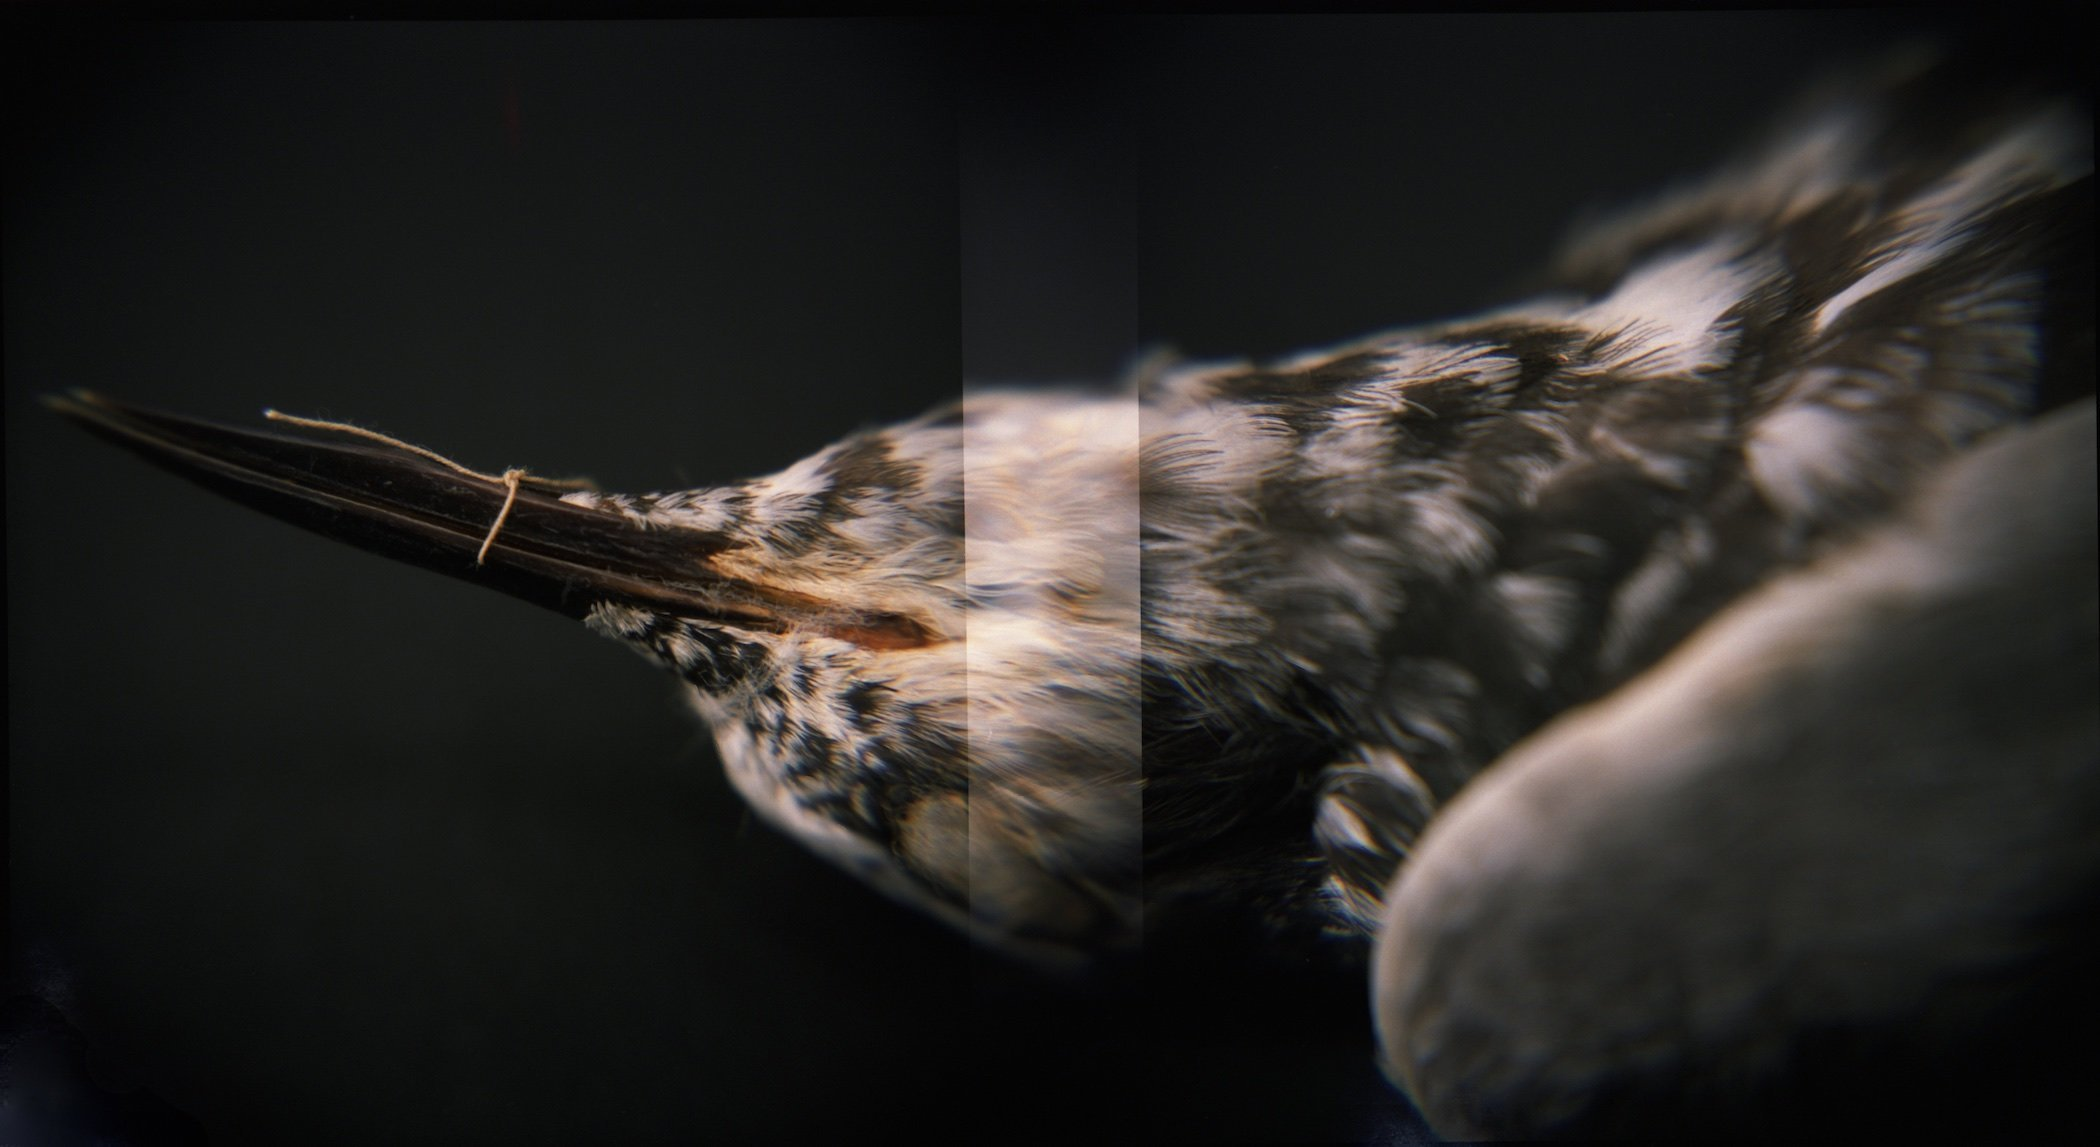 Black Tern (<i>Chlidonias niger surinamensis</i>), Holga 120N, Fuji Pro 400H, 2015